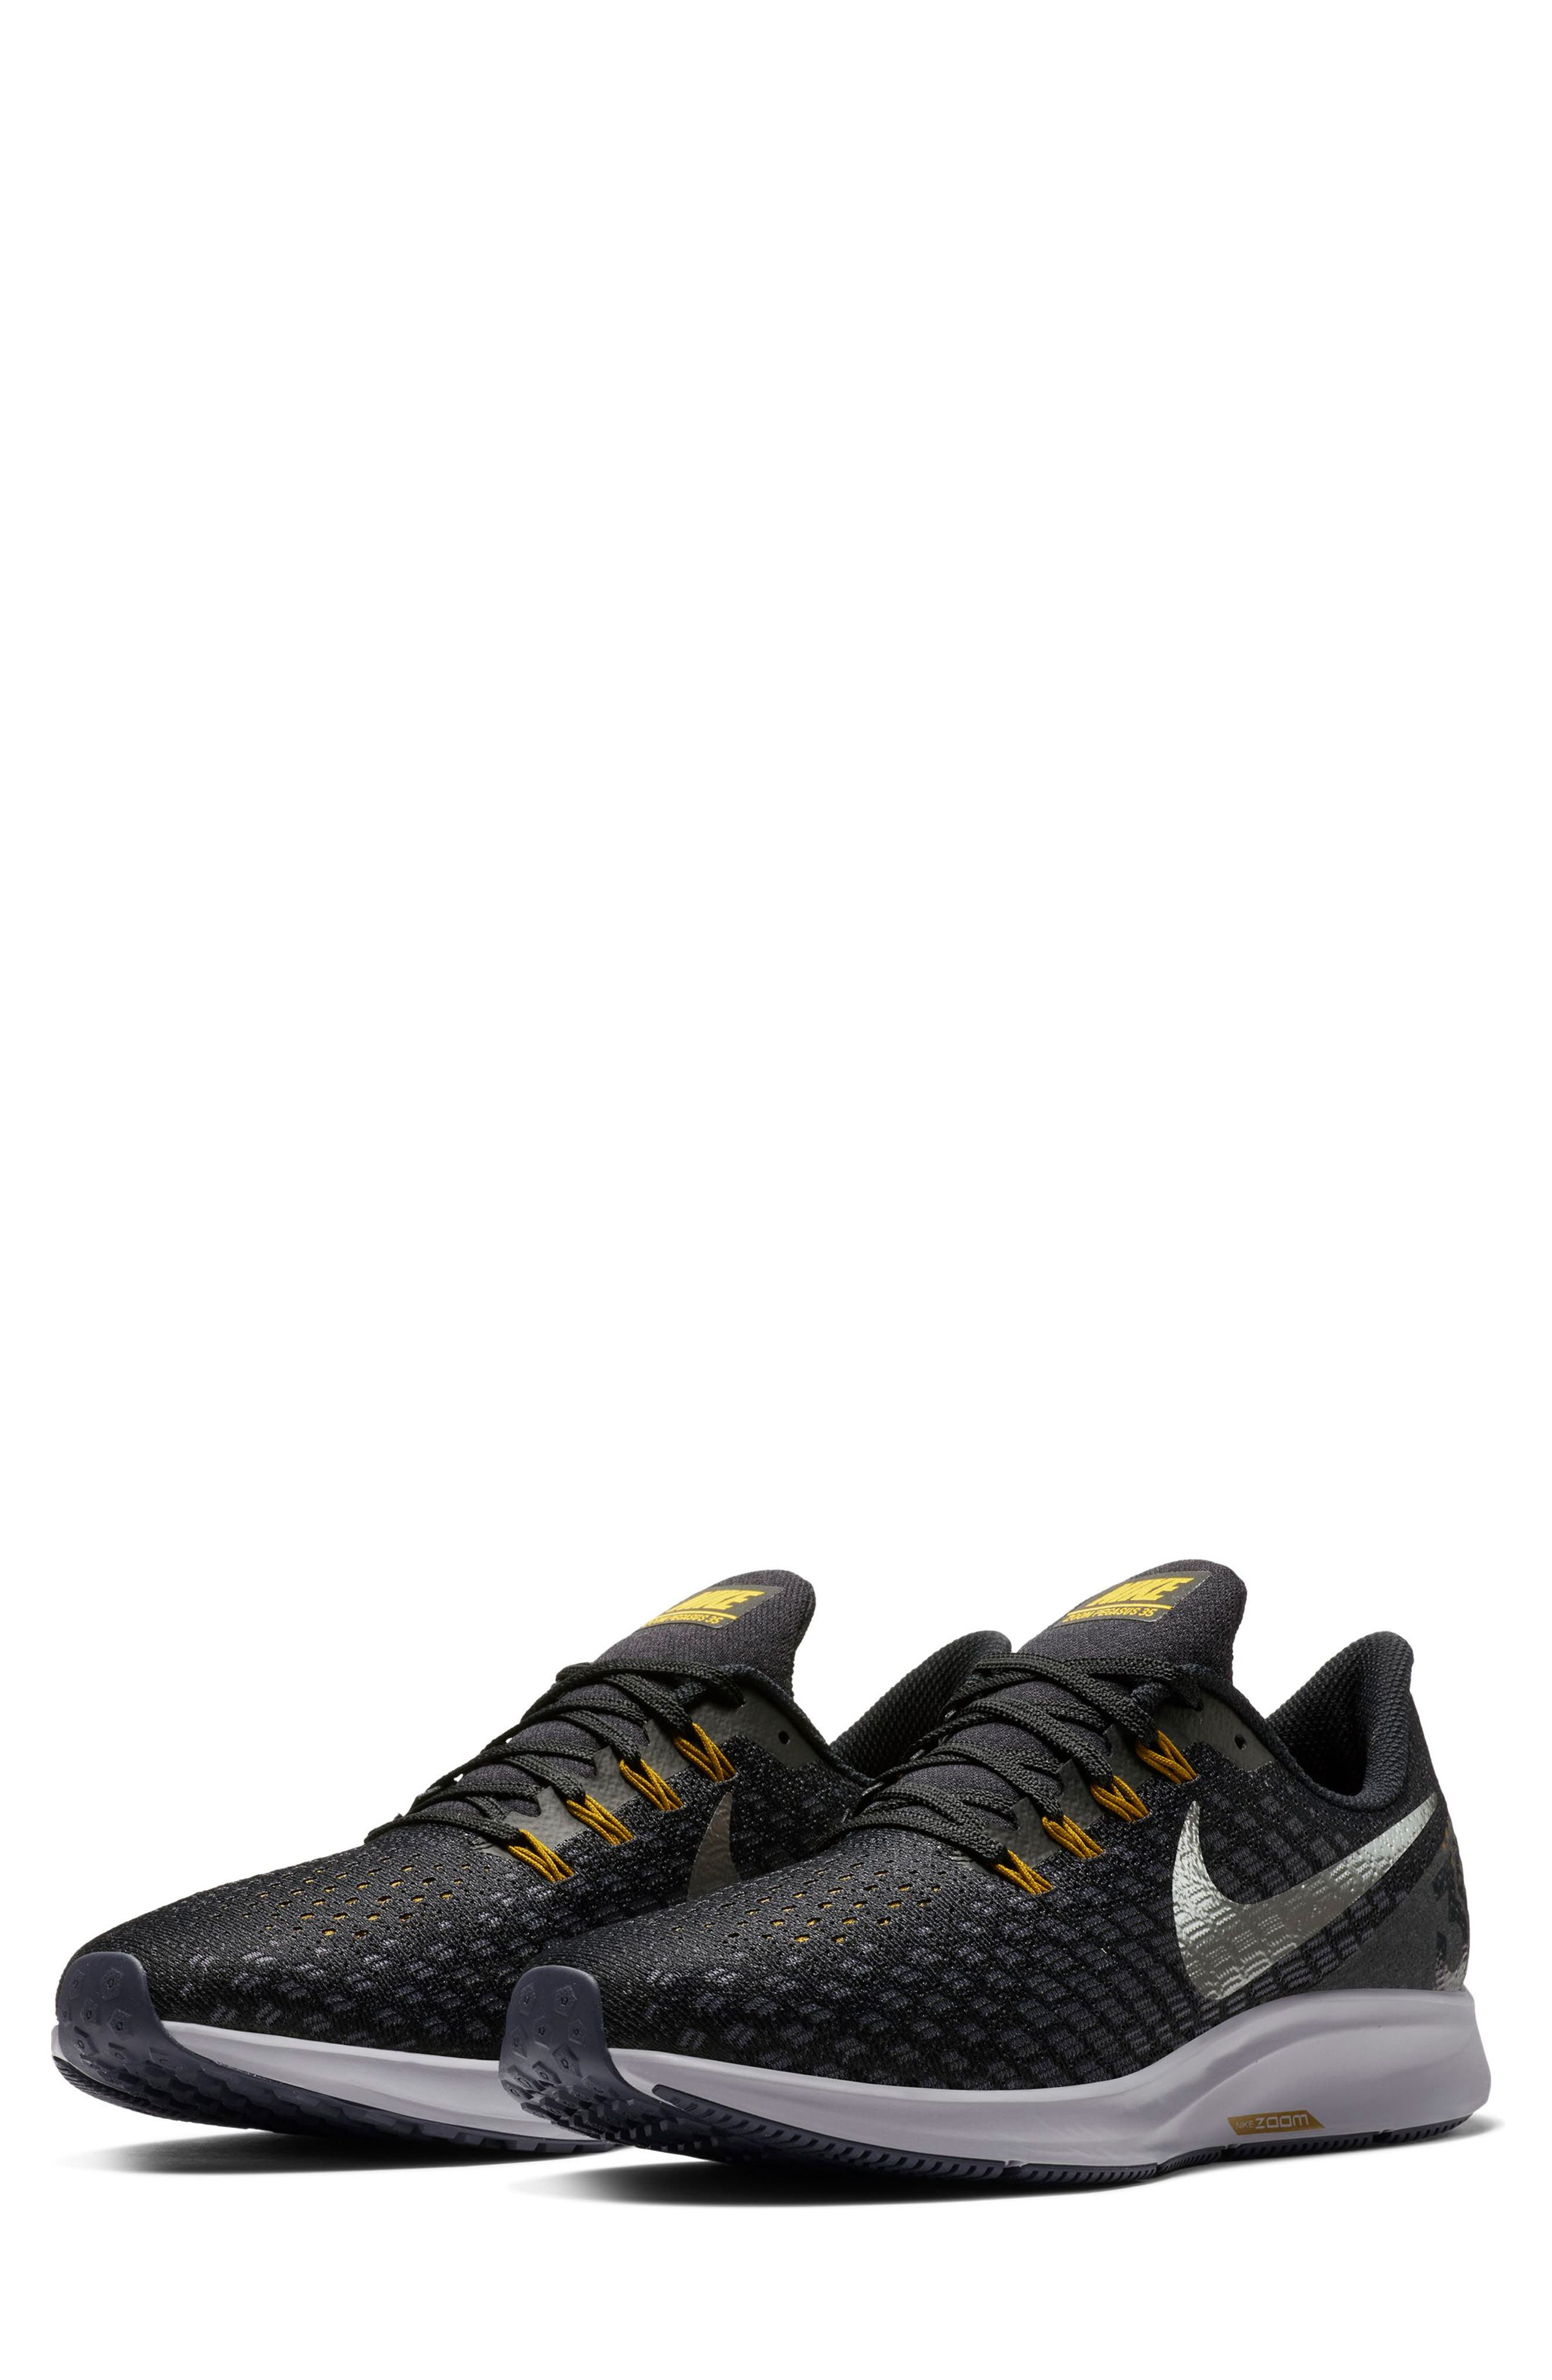 Air Zoom Pegasus 35 Running Shoe,                             Main thumbnail 1, color,                             BLACK/ PEWTER/ MOSS